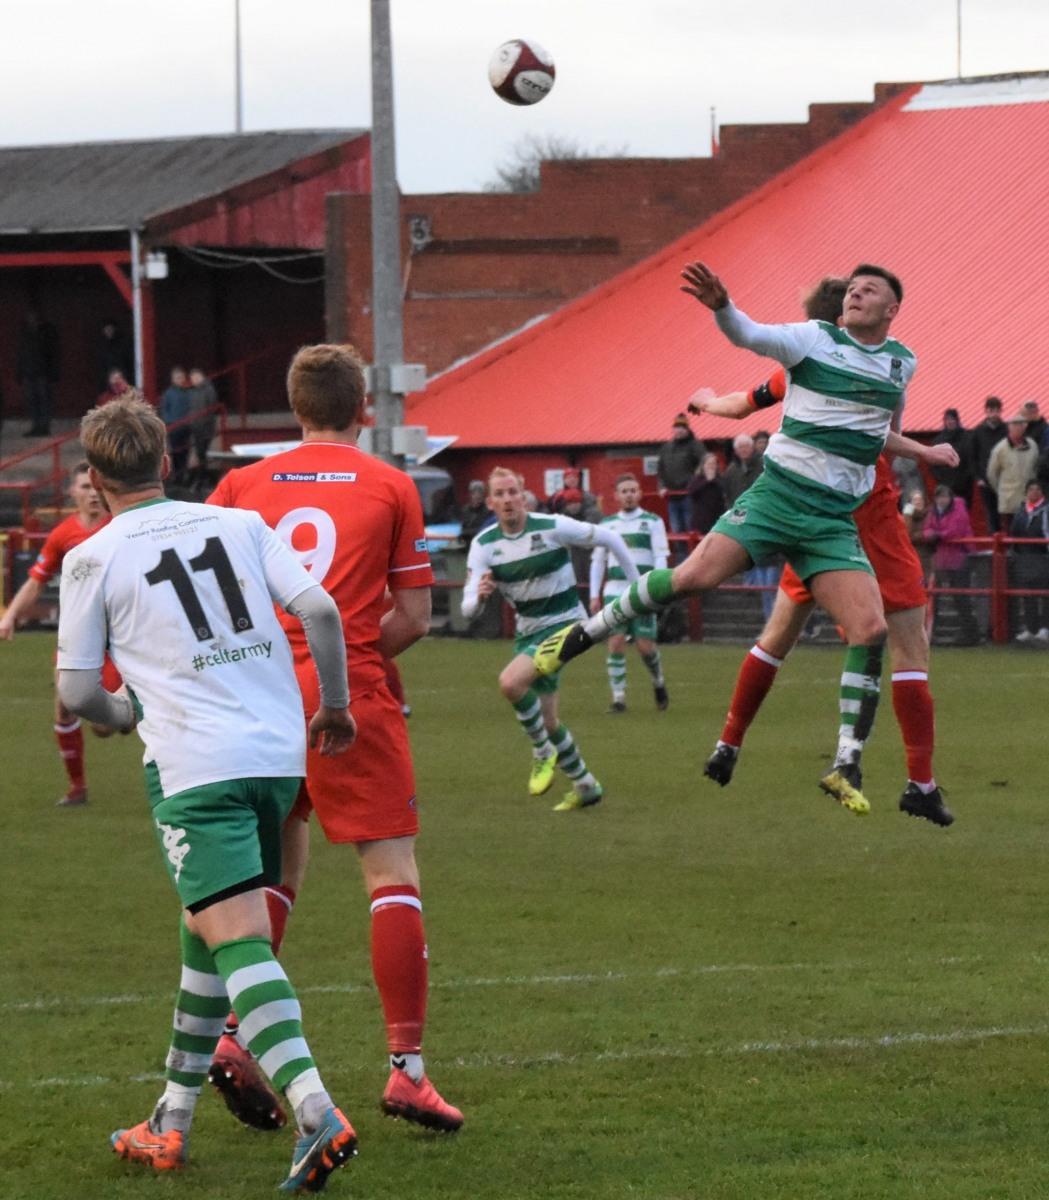 Workington-Reds-v-Farsley-Celtic-Ben-Challis-11-scaled